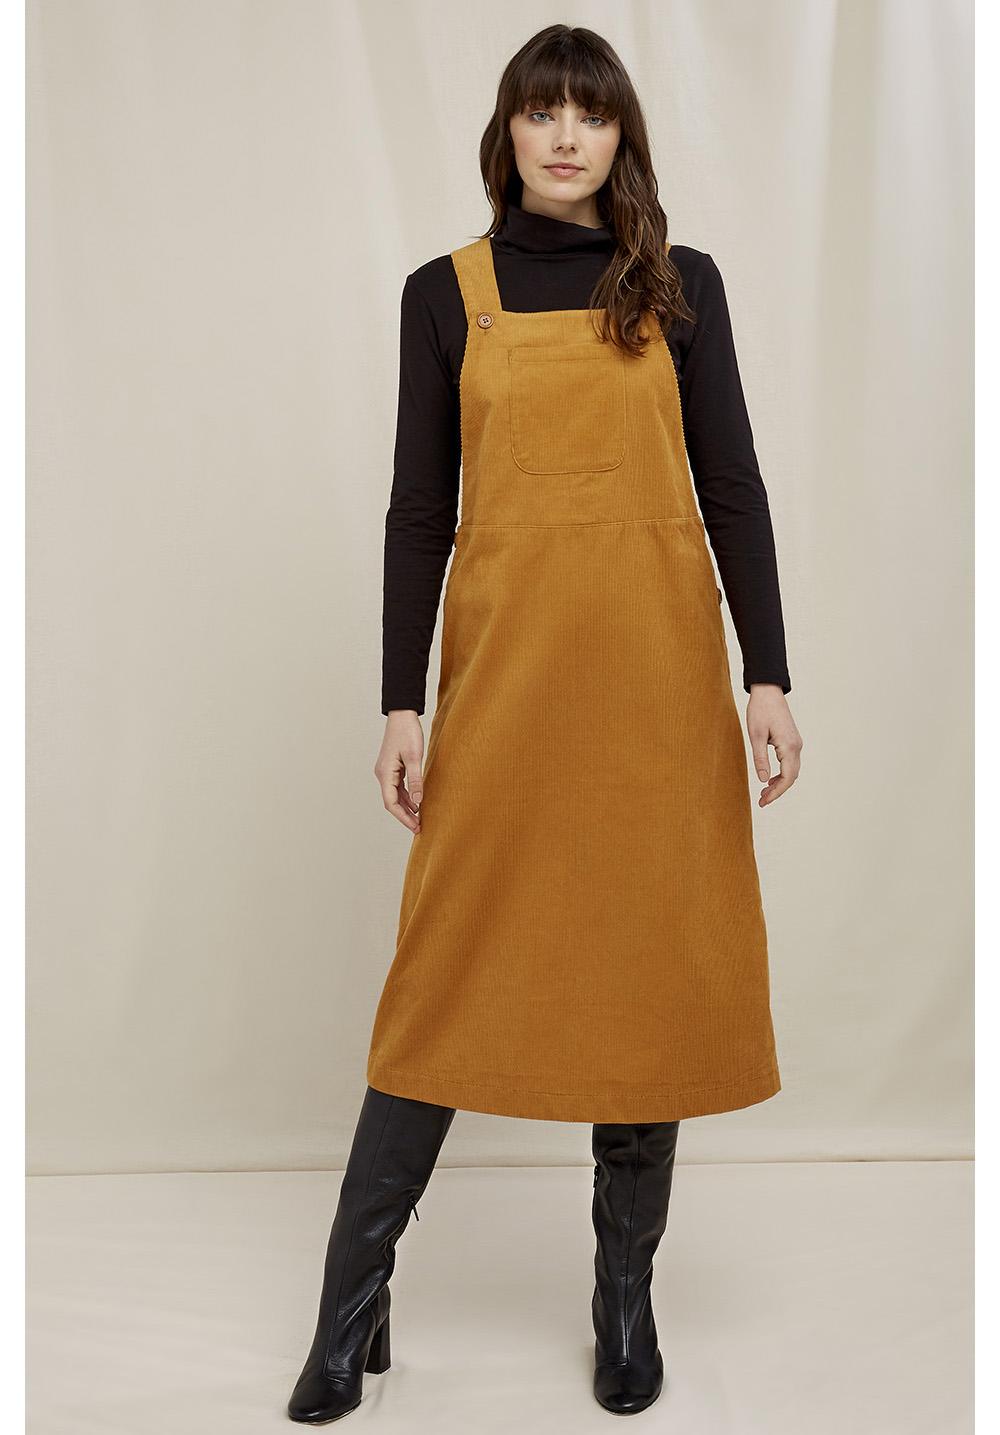 Mindy Corduroy Pinafore Dress 8